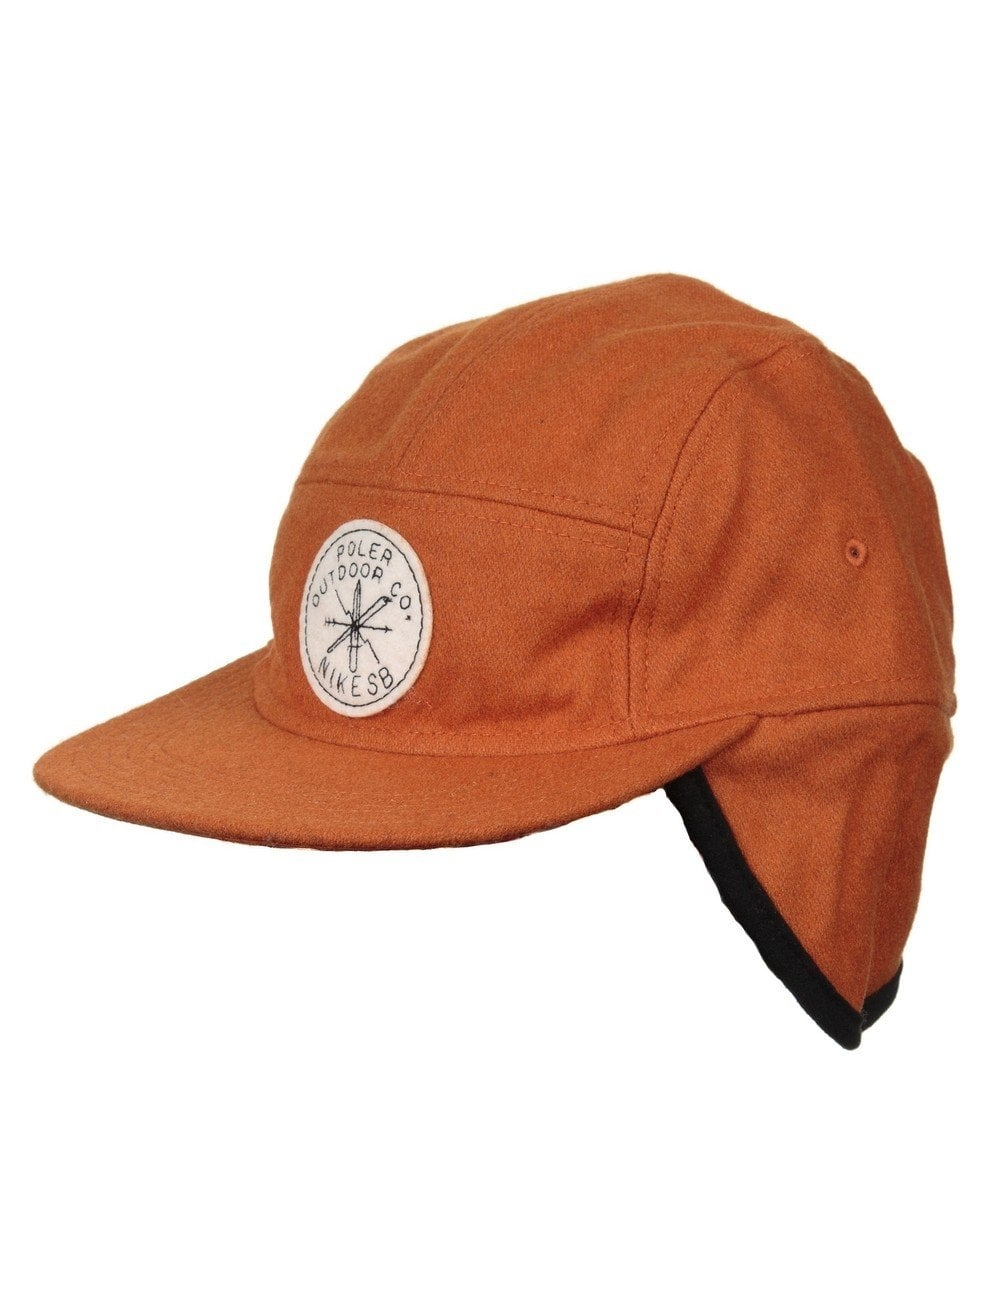 bbea45cd890c9 Nike SB x Poler 5 Panel Winter Hat - Orange - Accessories from Fat ...